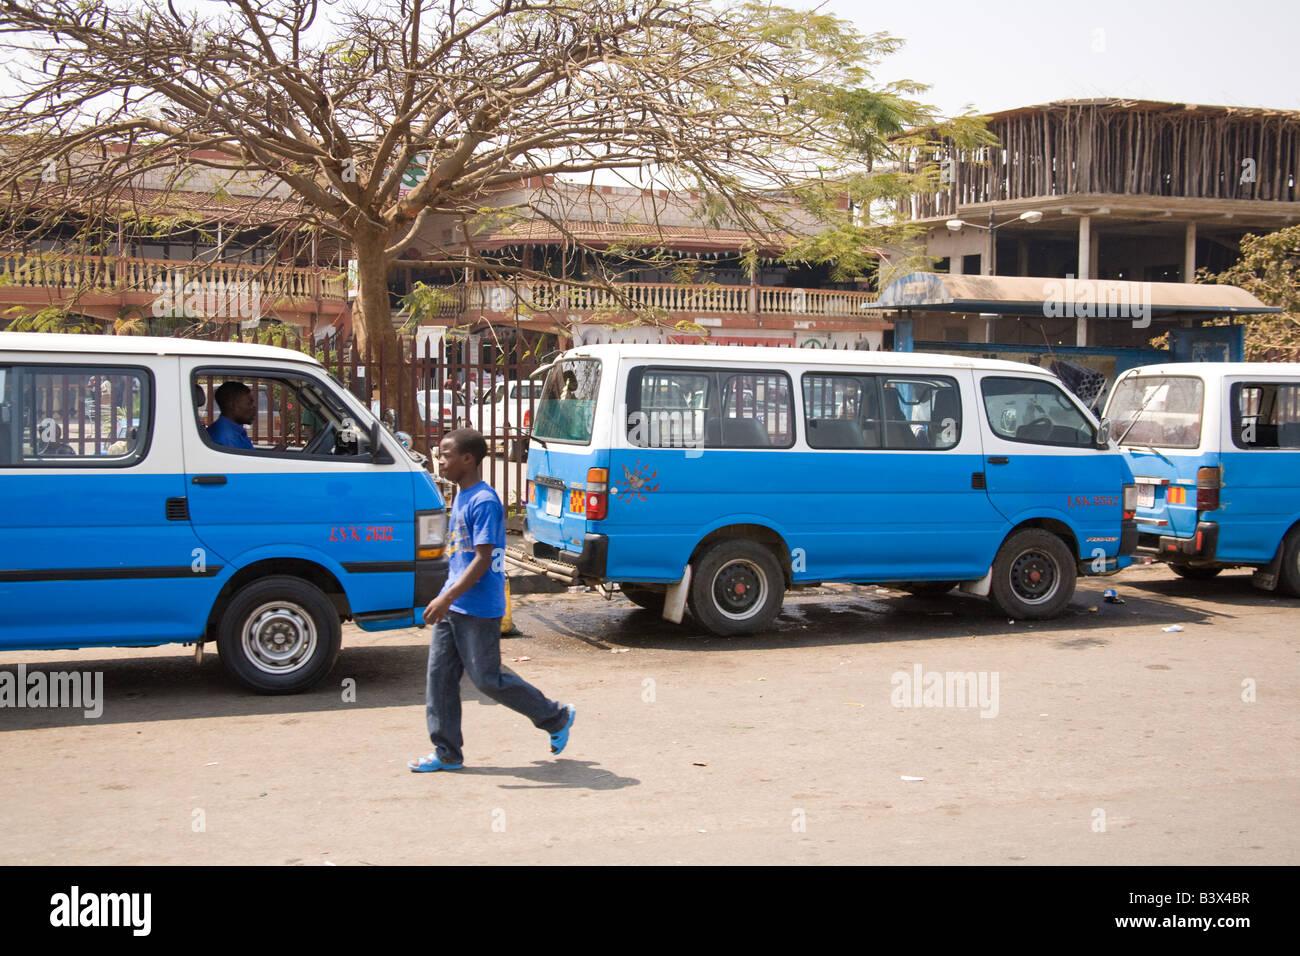 Mini bus taxis Lusaka Zambia Africa - Stock Image